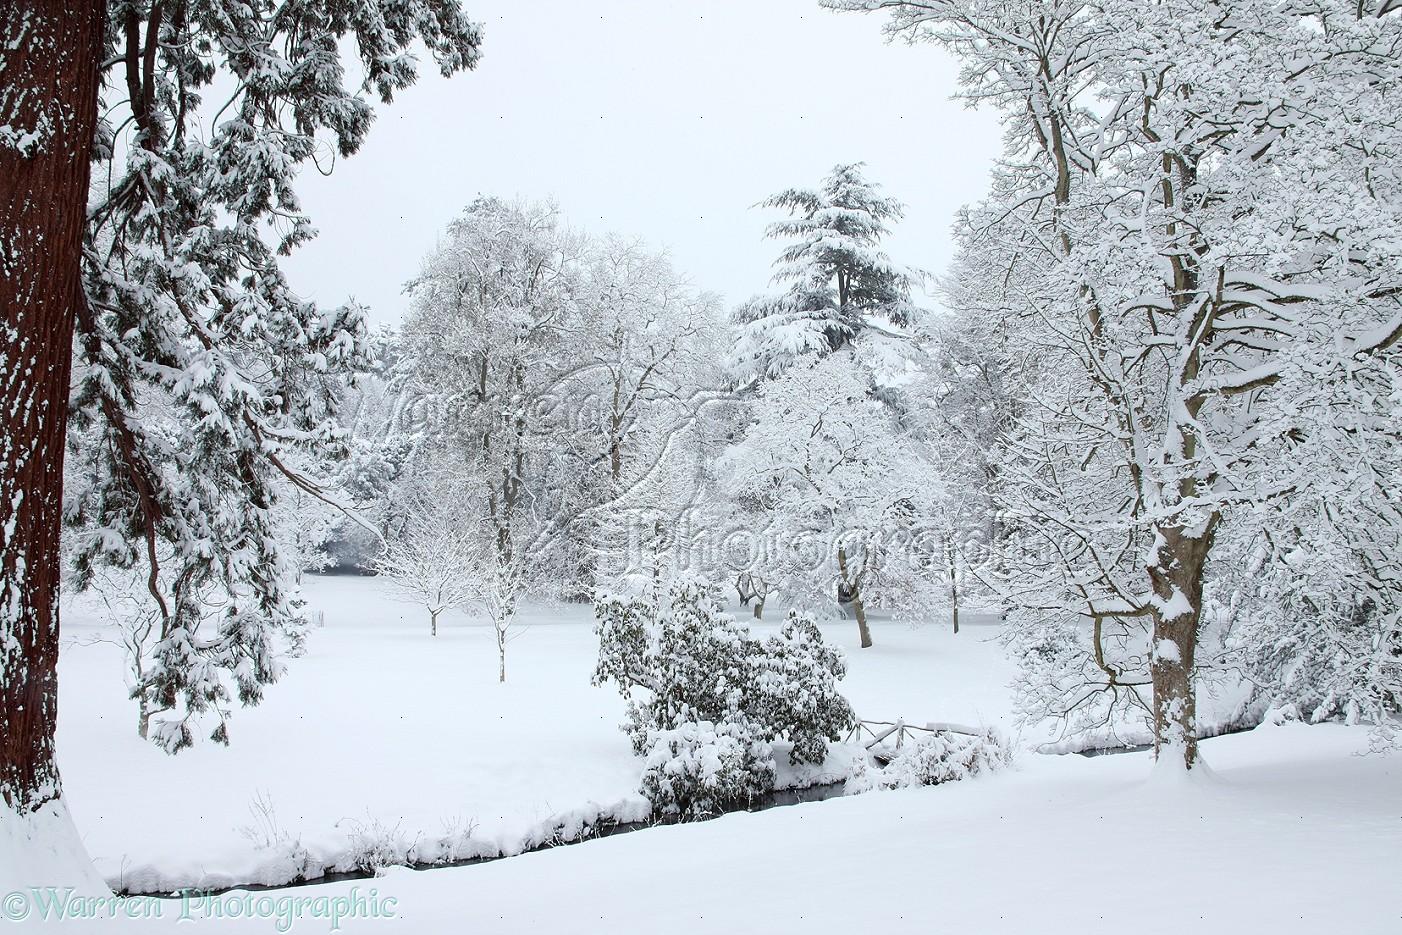 Wp22642 snowy scenery in albury park surrey england